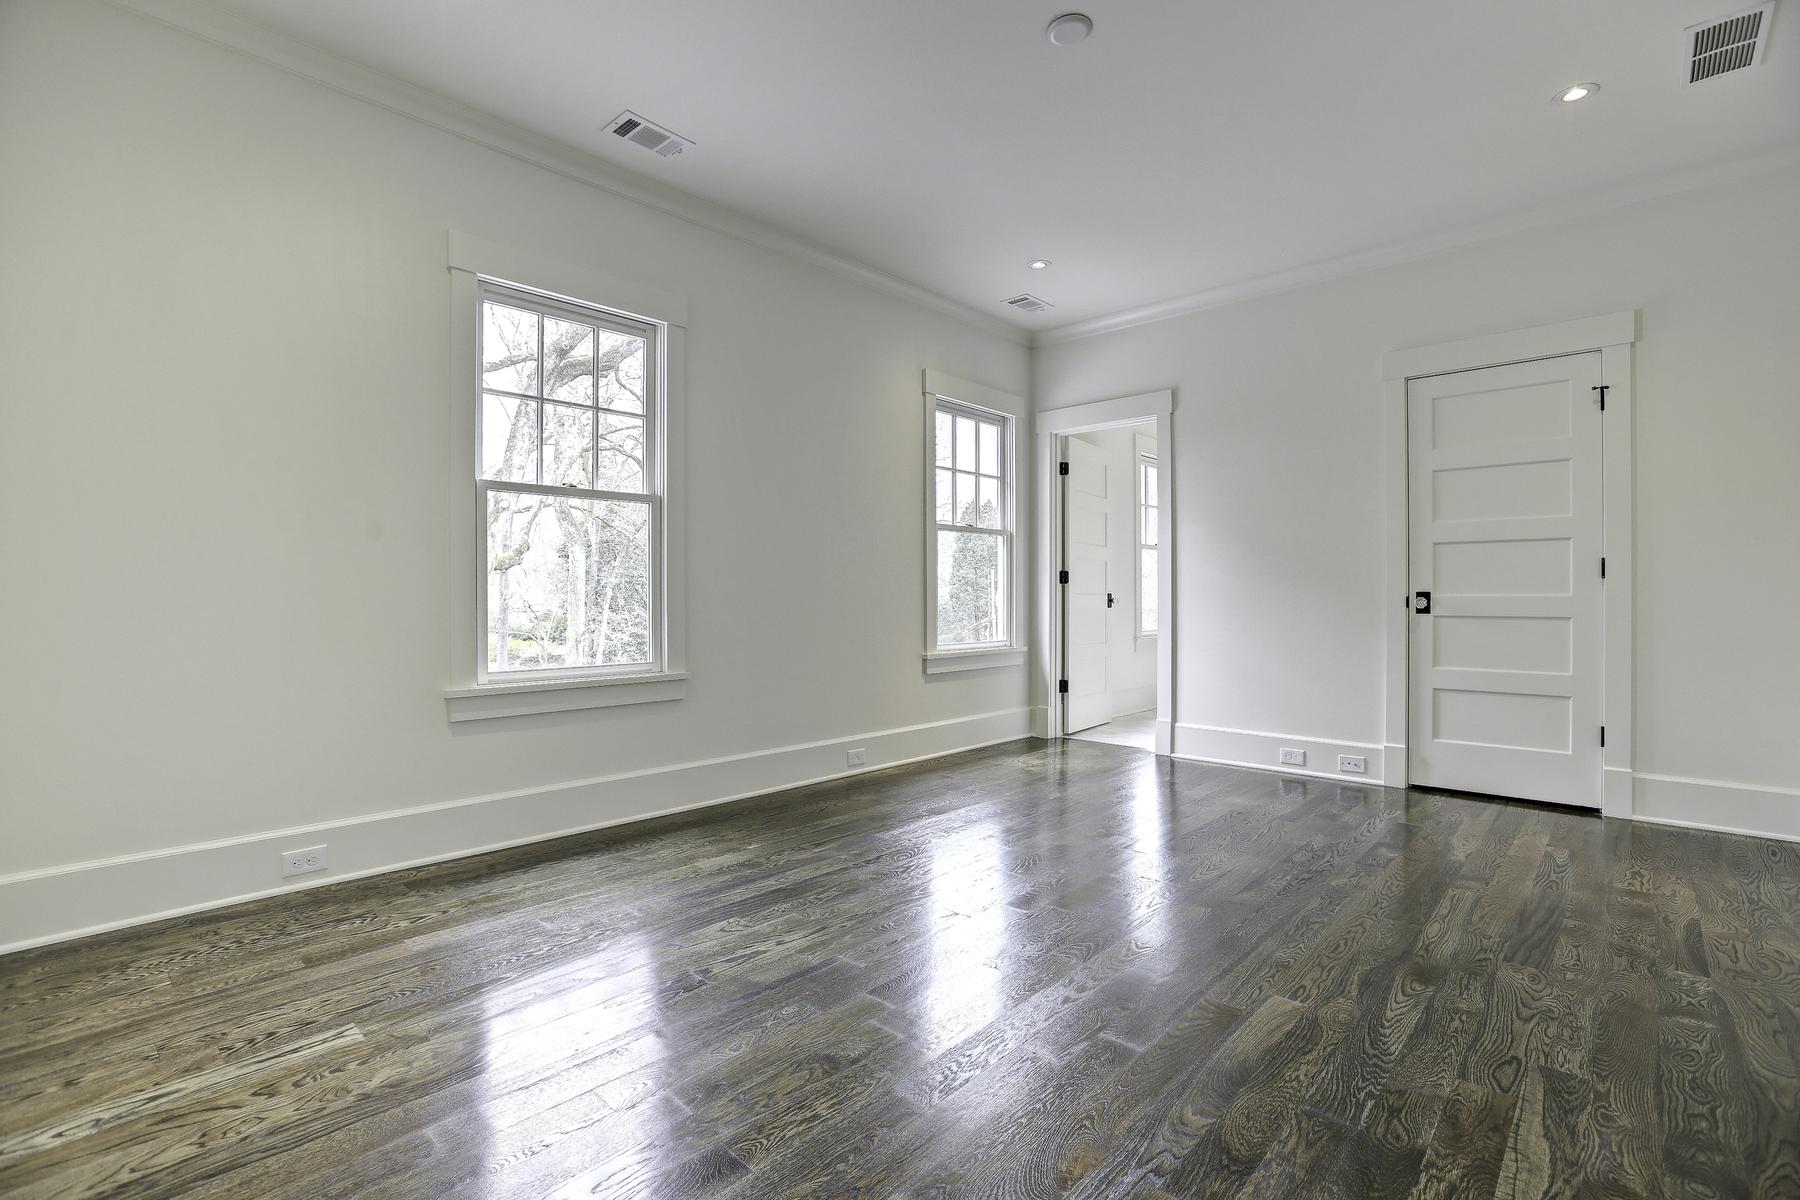 Additional photo for property listing at Deluxe Custom New Construction by Jackbilt Homes on Sought-After Street 479 Argonne Drive NW Atlanta, Γεωργια 30305 Ηνωμενεσ Πολιτειεσ